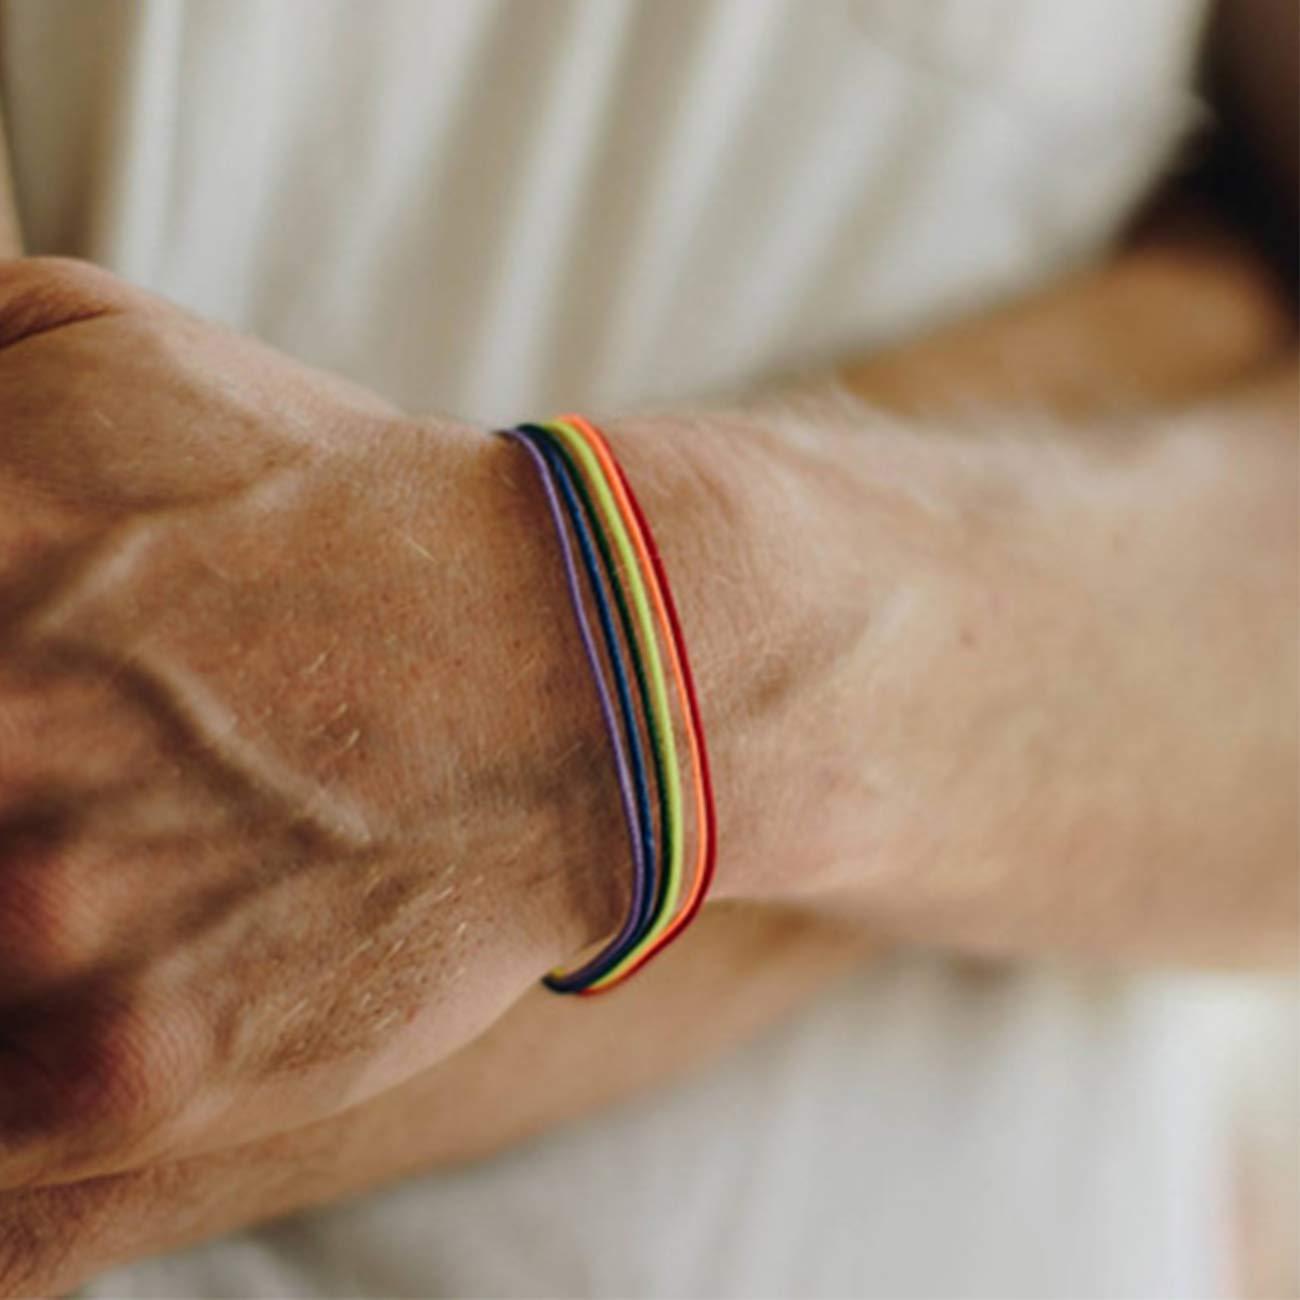 Pride Tinsow 5 Pack Pride Month Rainbow Bracelet Handmade Wristband LGBTQ